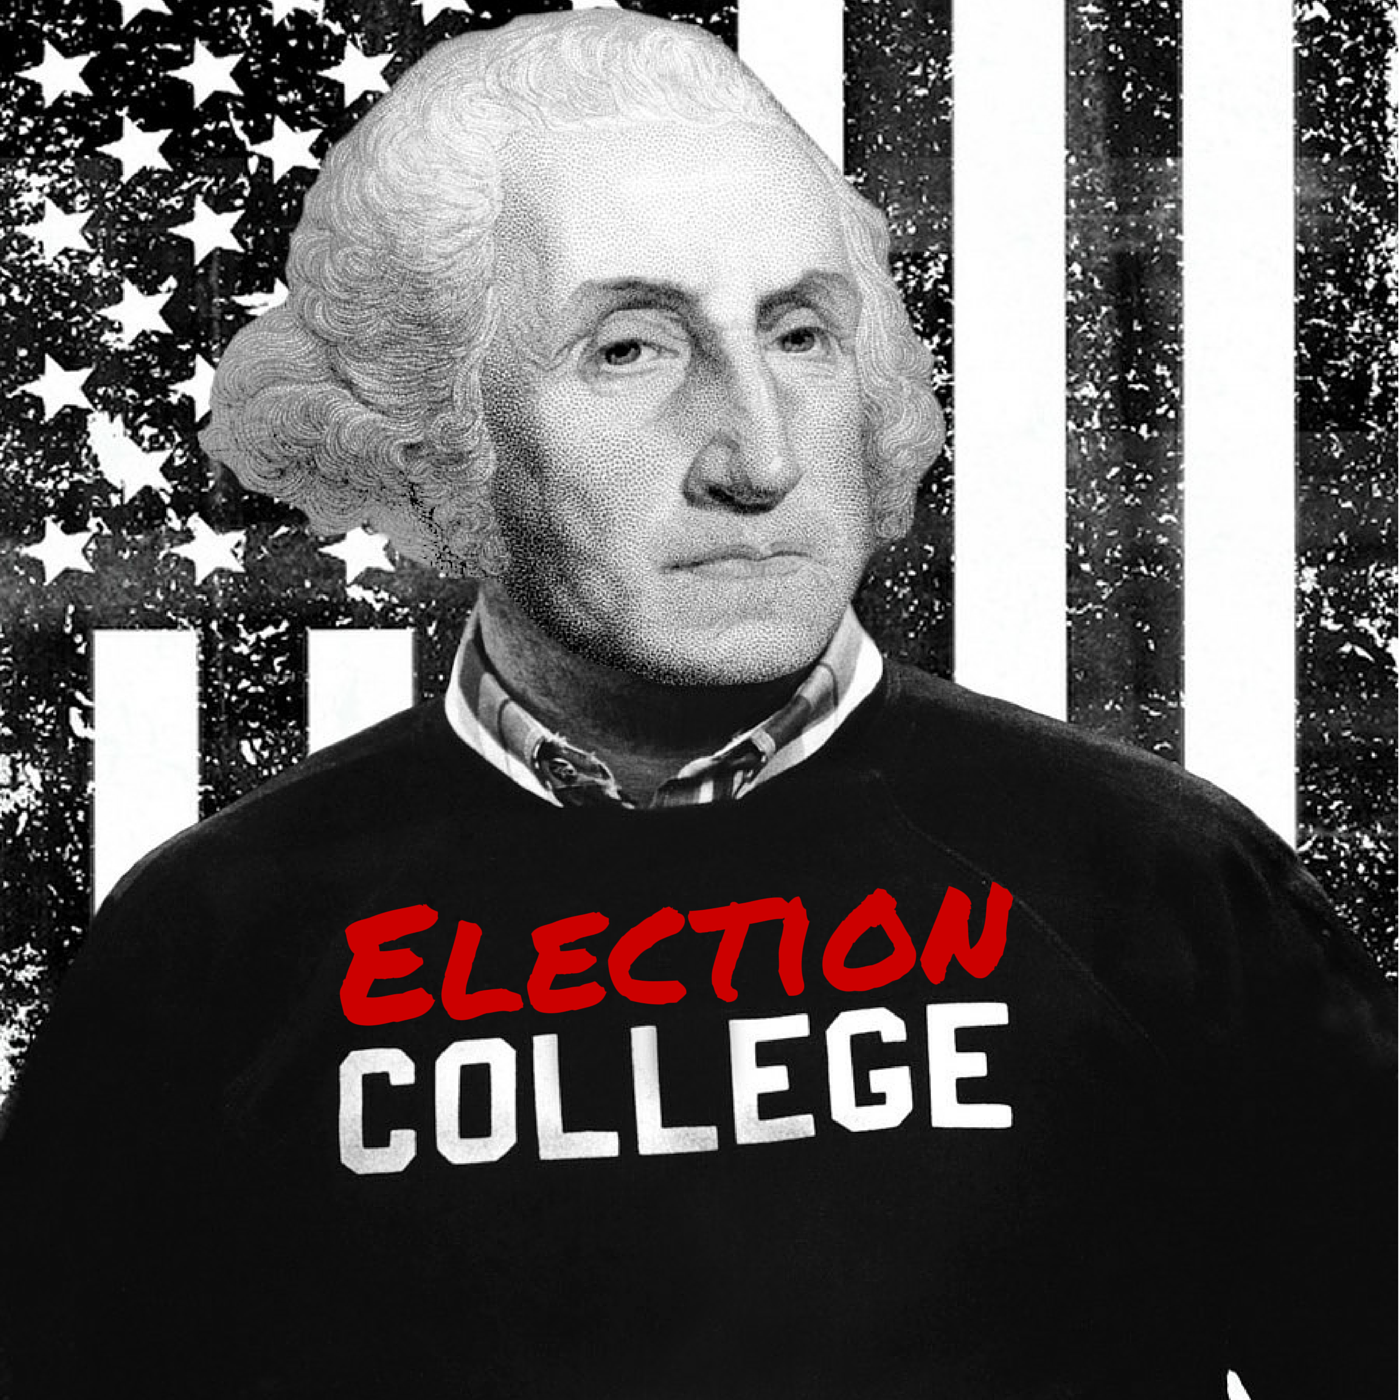 Superdelegates   Episode #086   Election College: United States Presidential Election History